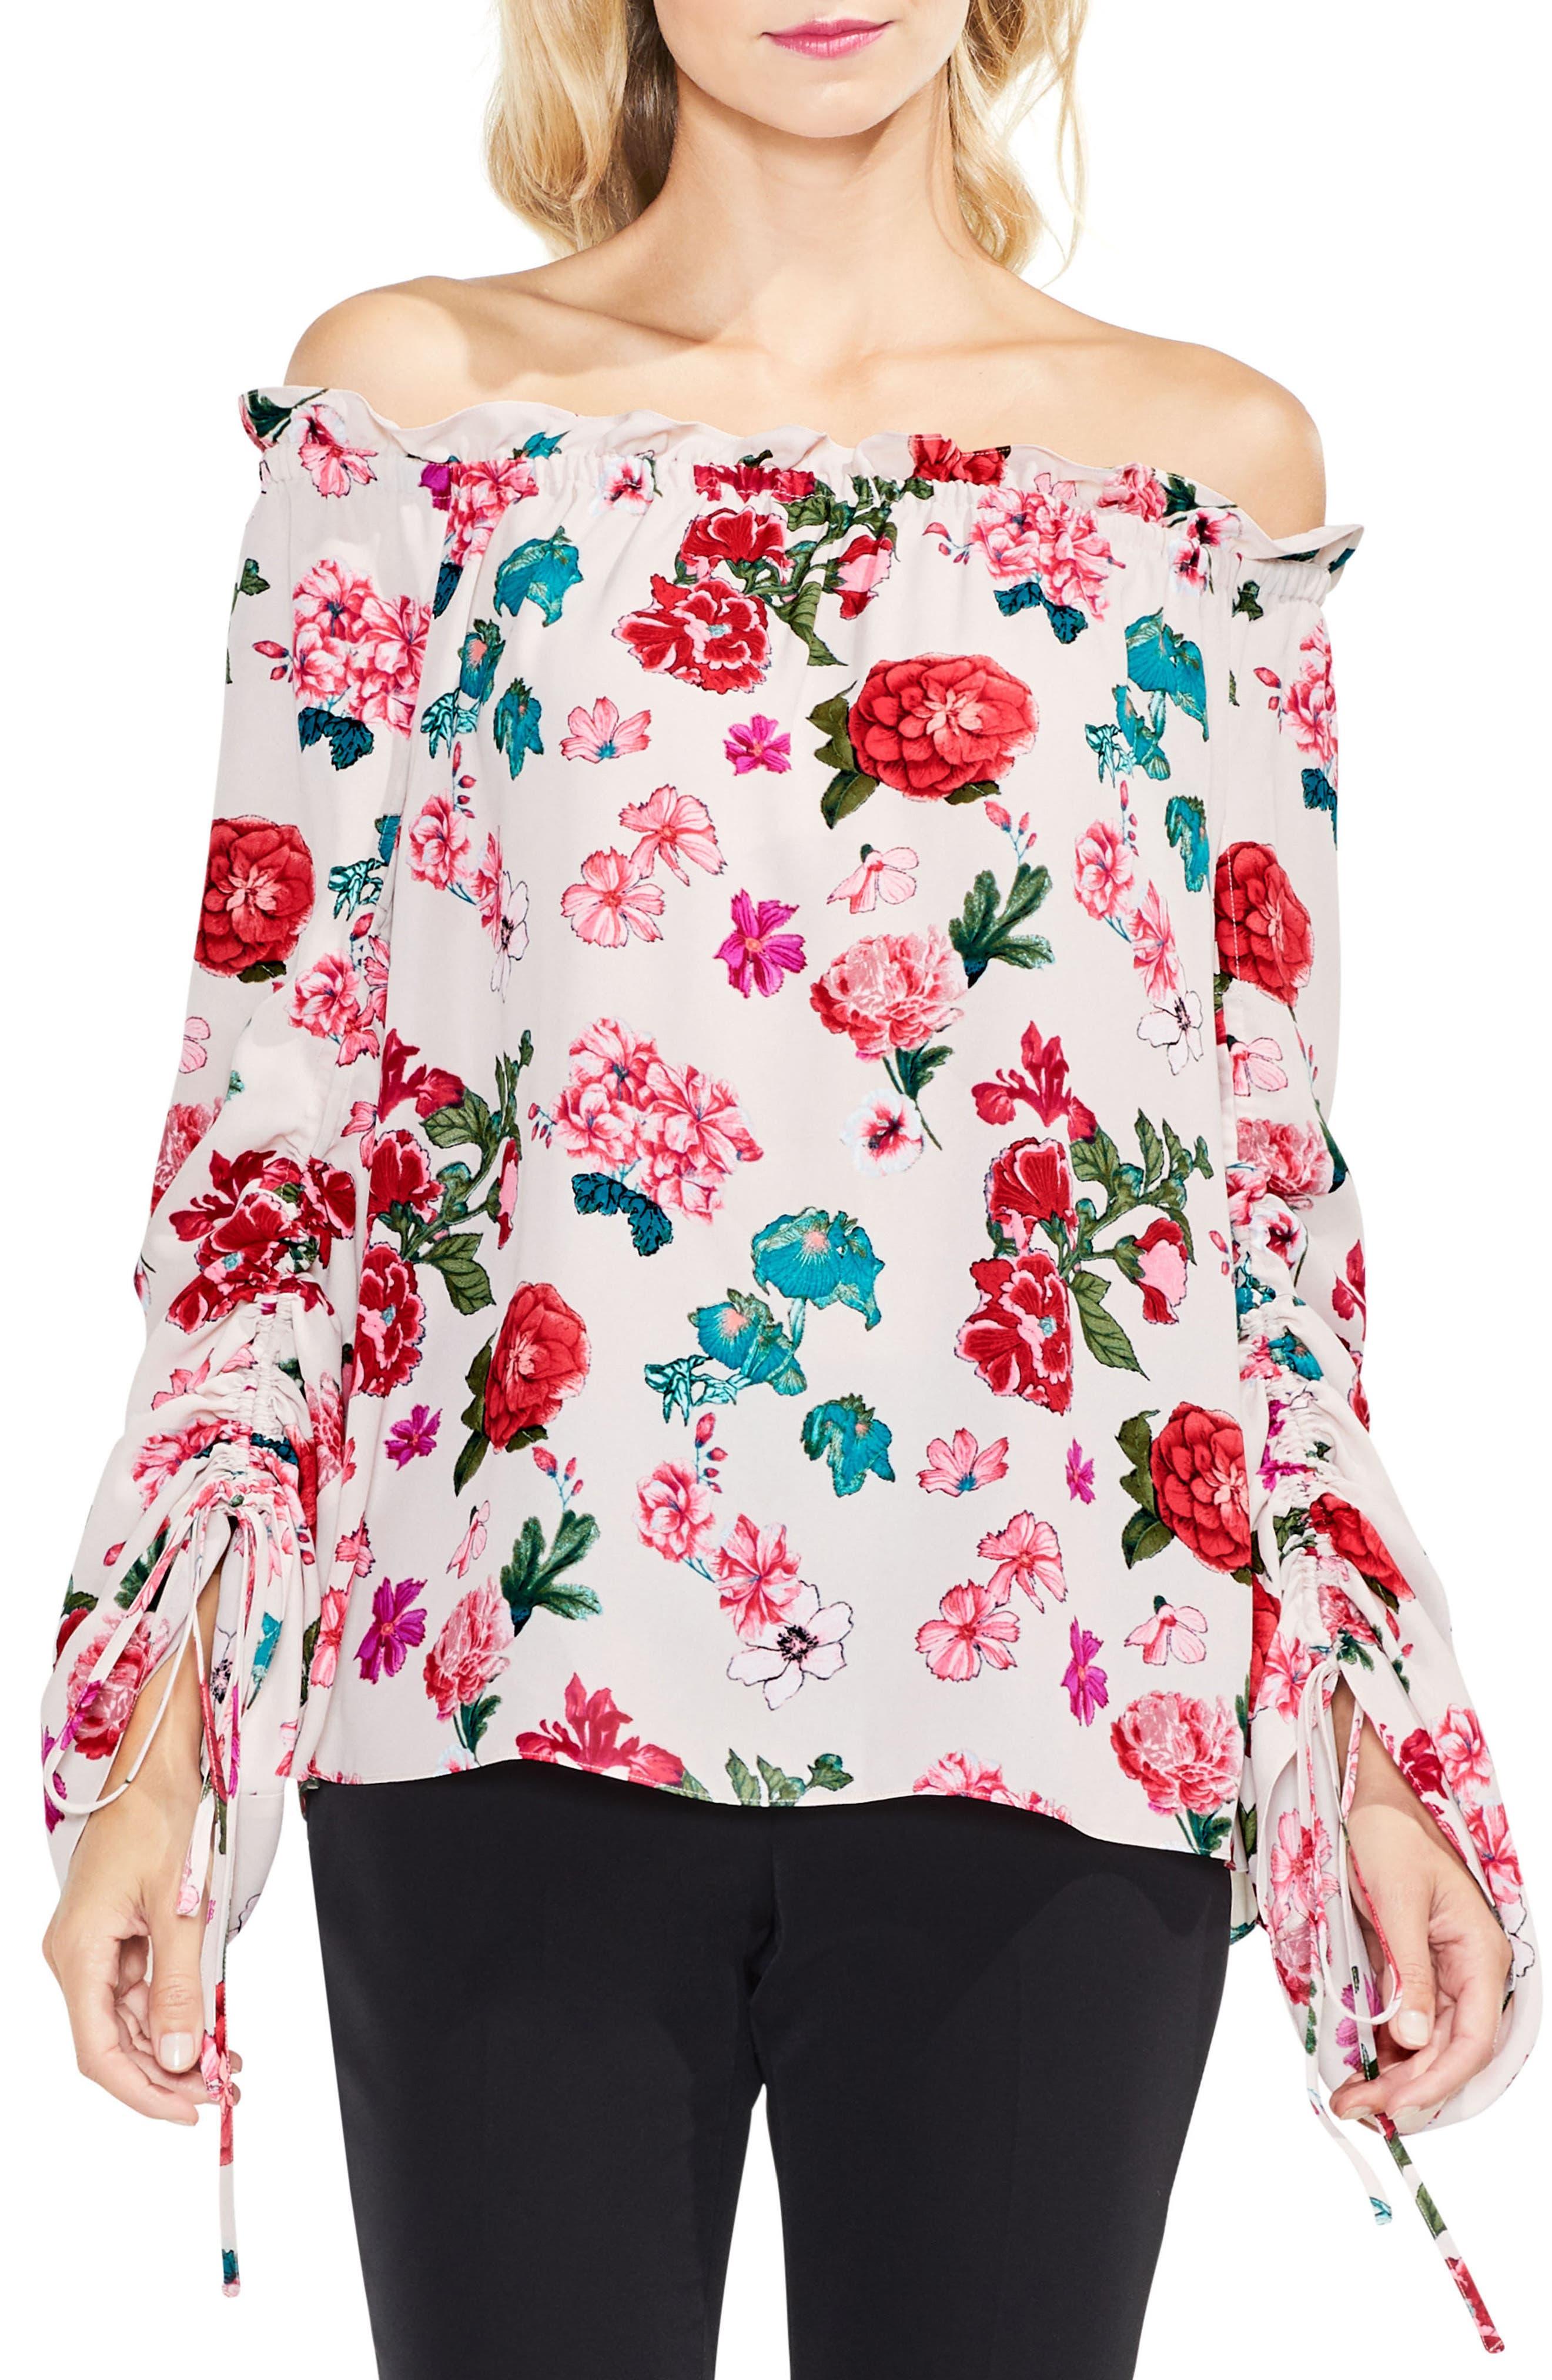 Off the Shoulder Floral Heirloom Top,                             Main thumbnail 1, color,                             Hush Pink